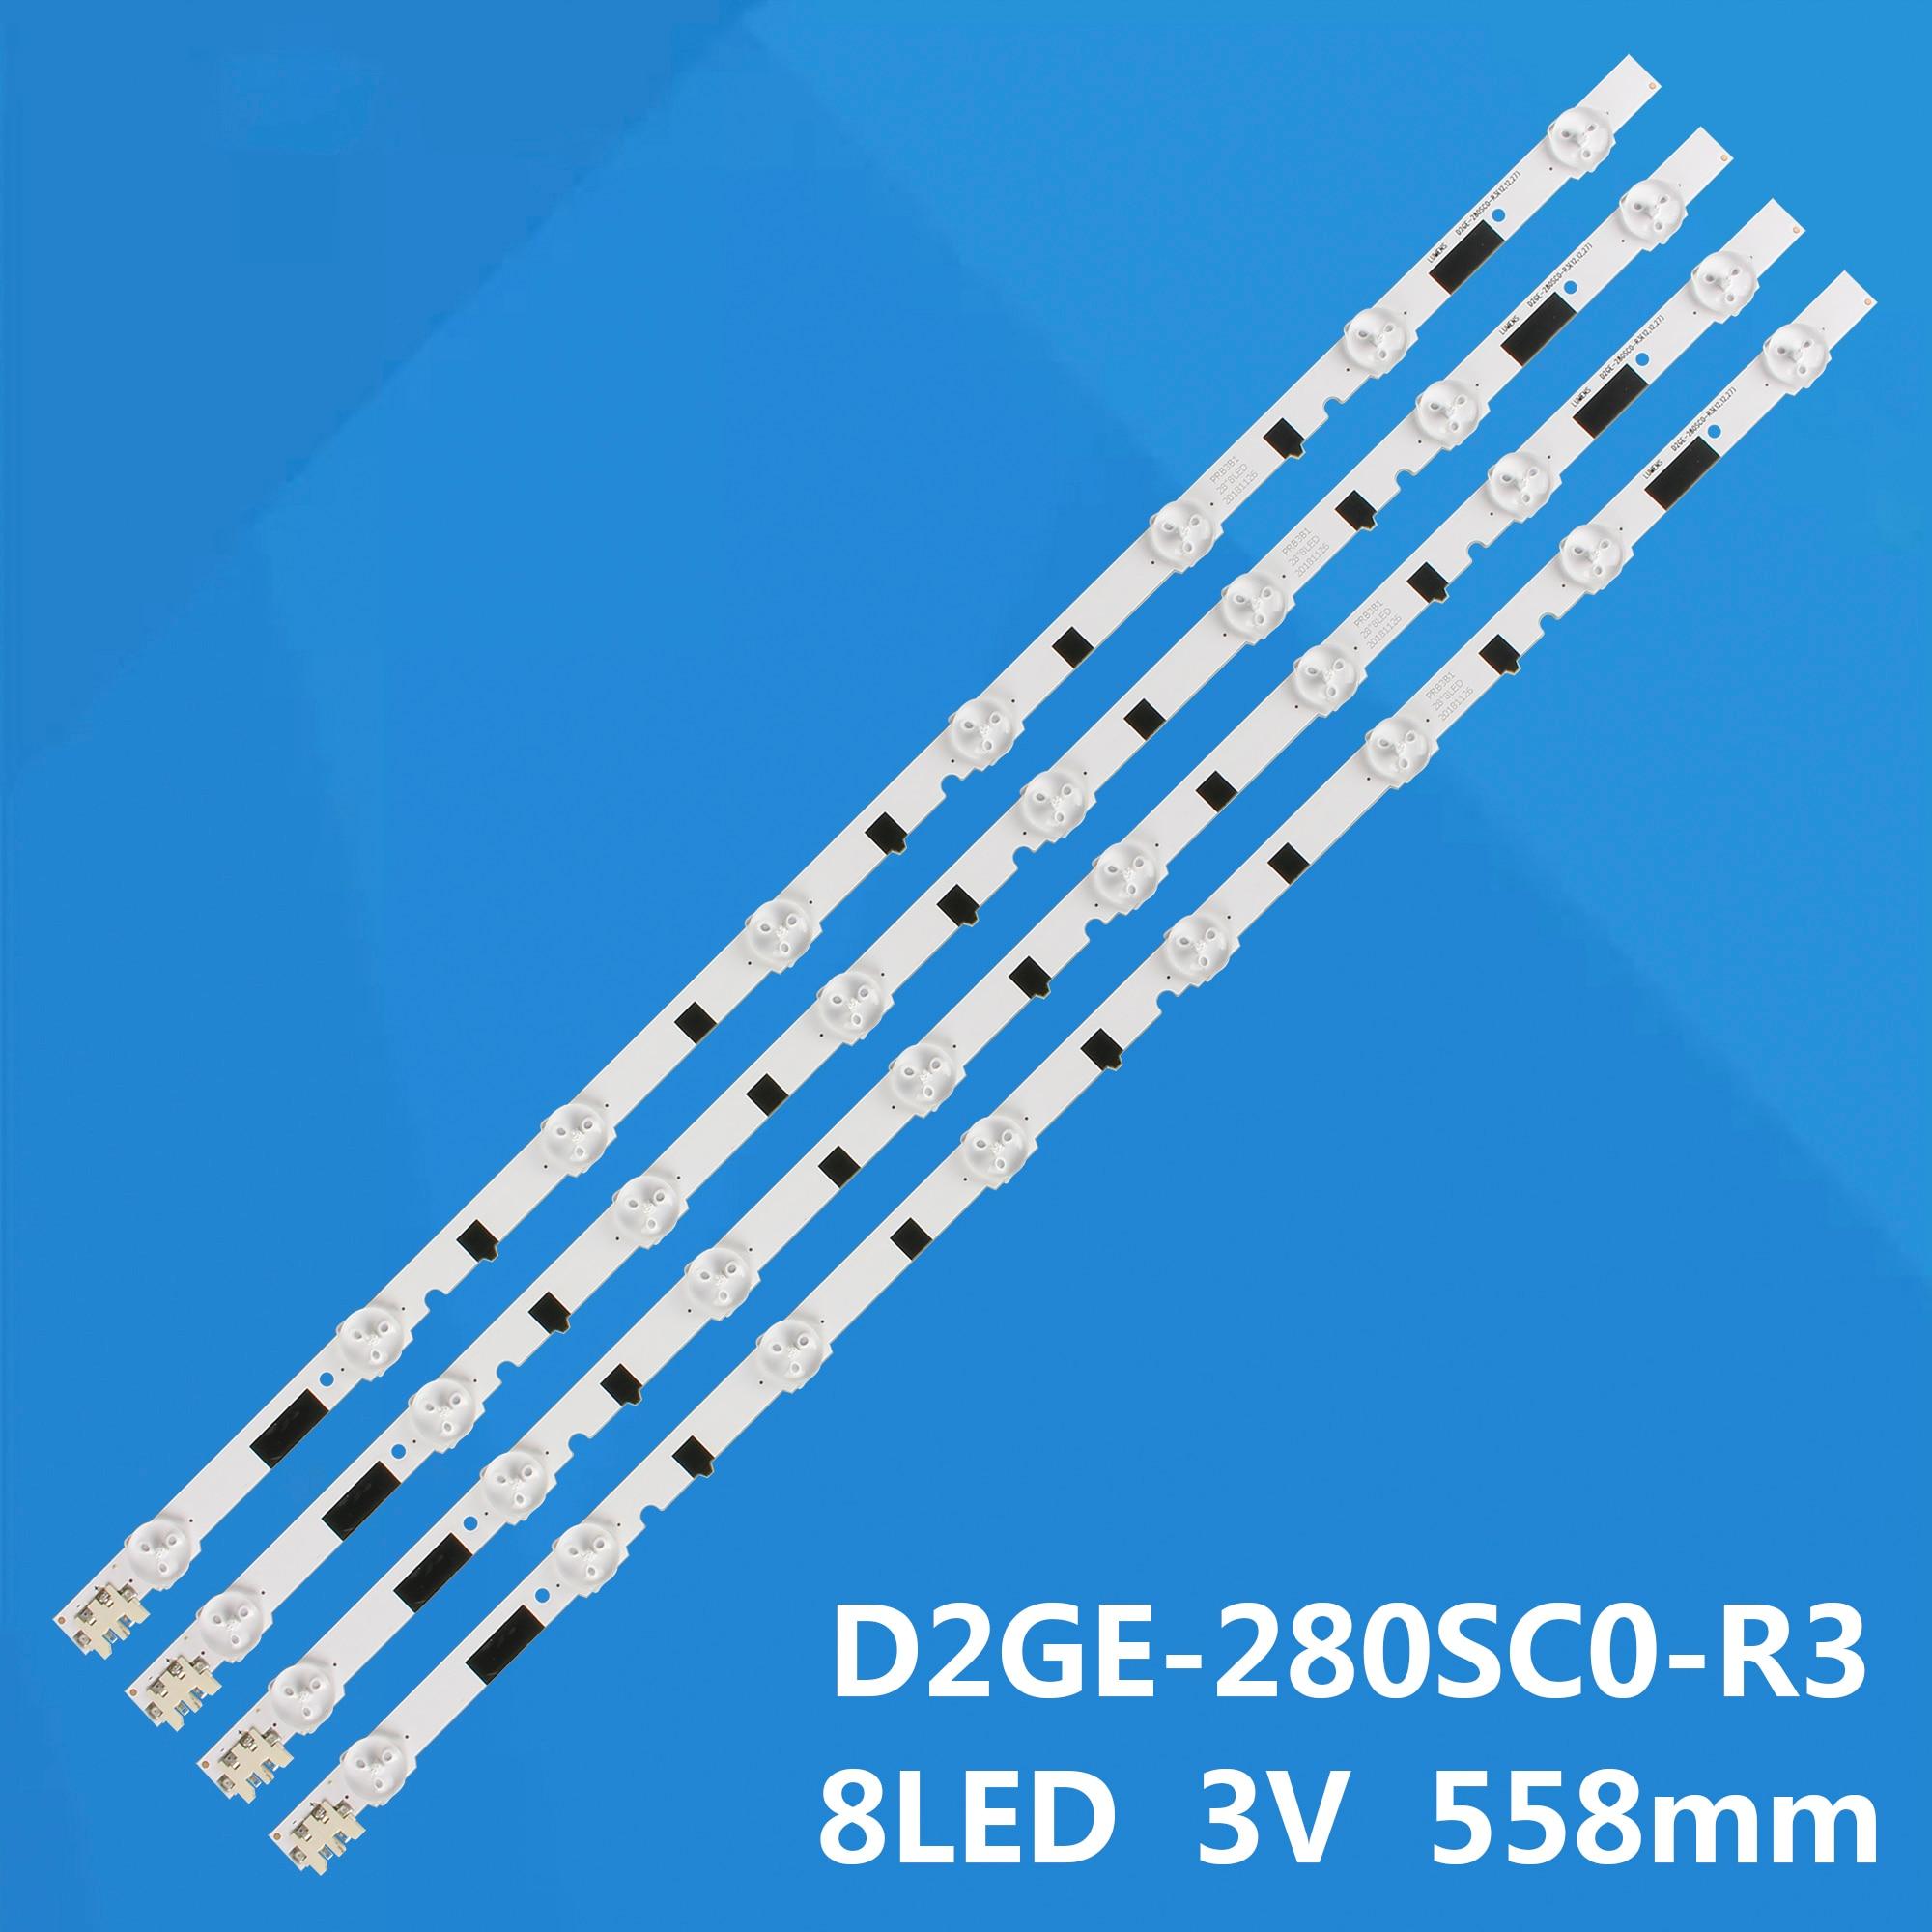 Nuevo 4 Uds * 8LEDs, 558mm retroiluminación LED D2GE-280SC0-R3 2013SVS28H para sam sung UA28F4088AR UE28F5000 UE28F4000AS HG28EB670 UE28F4000